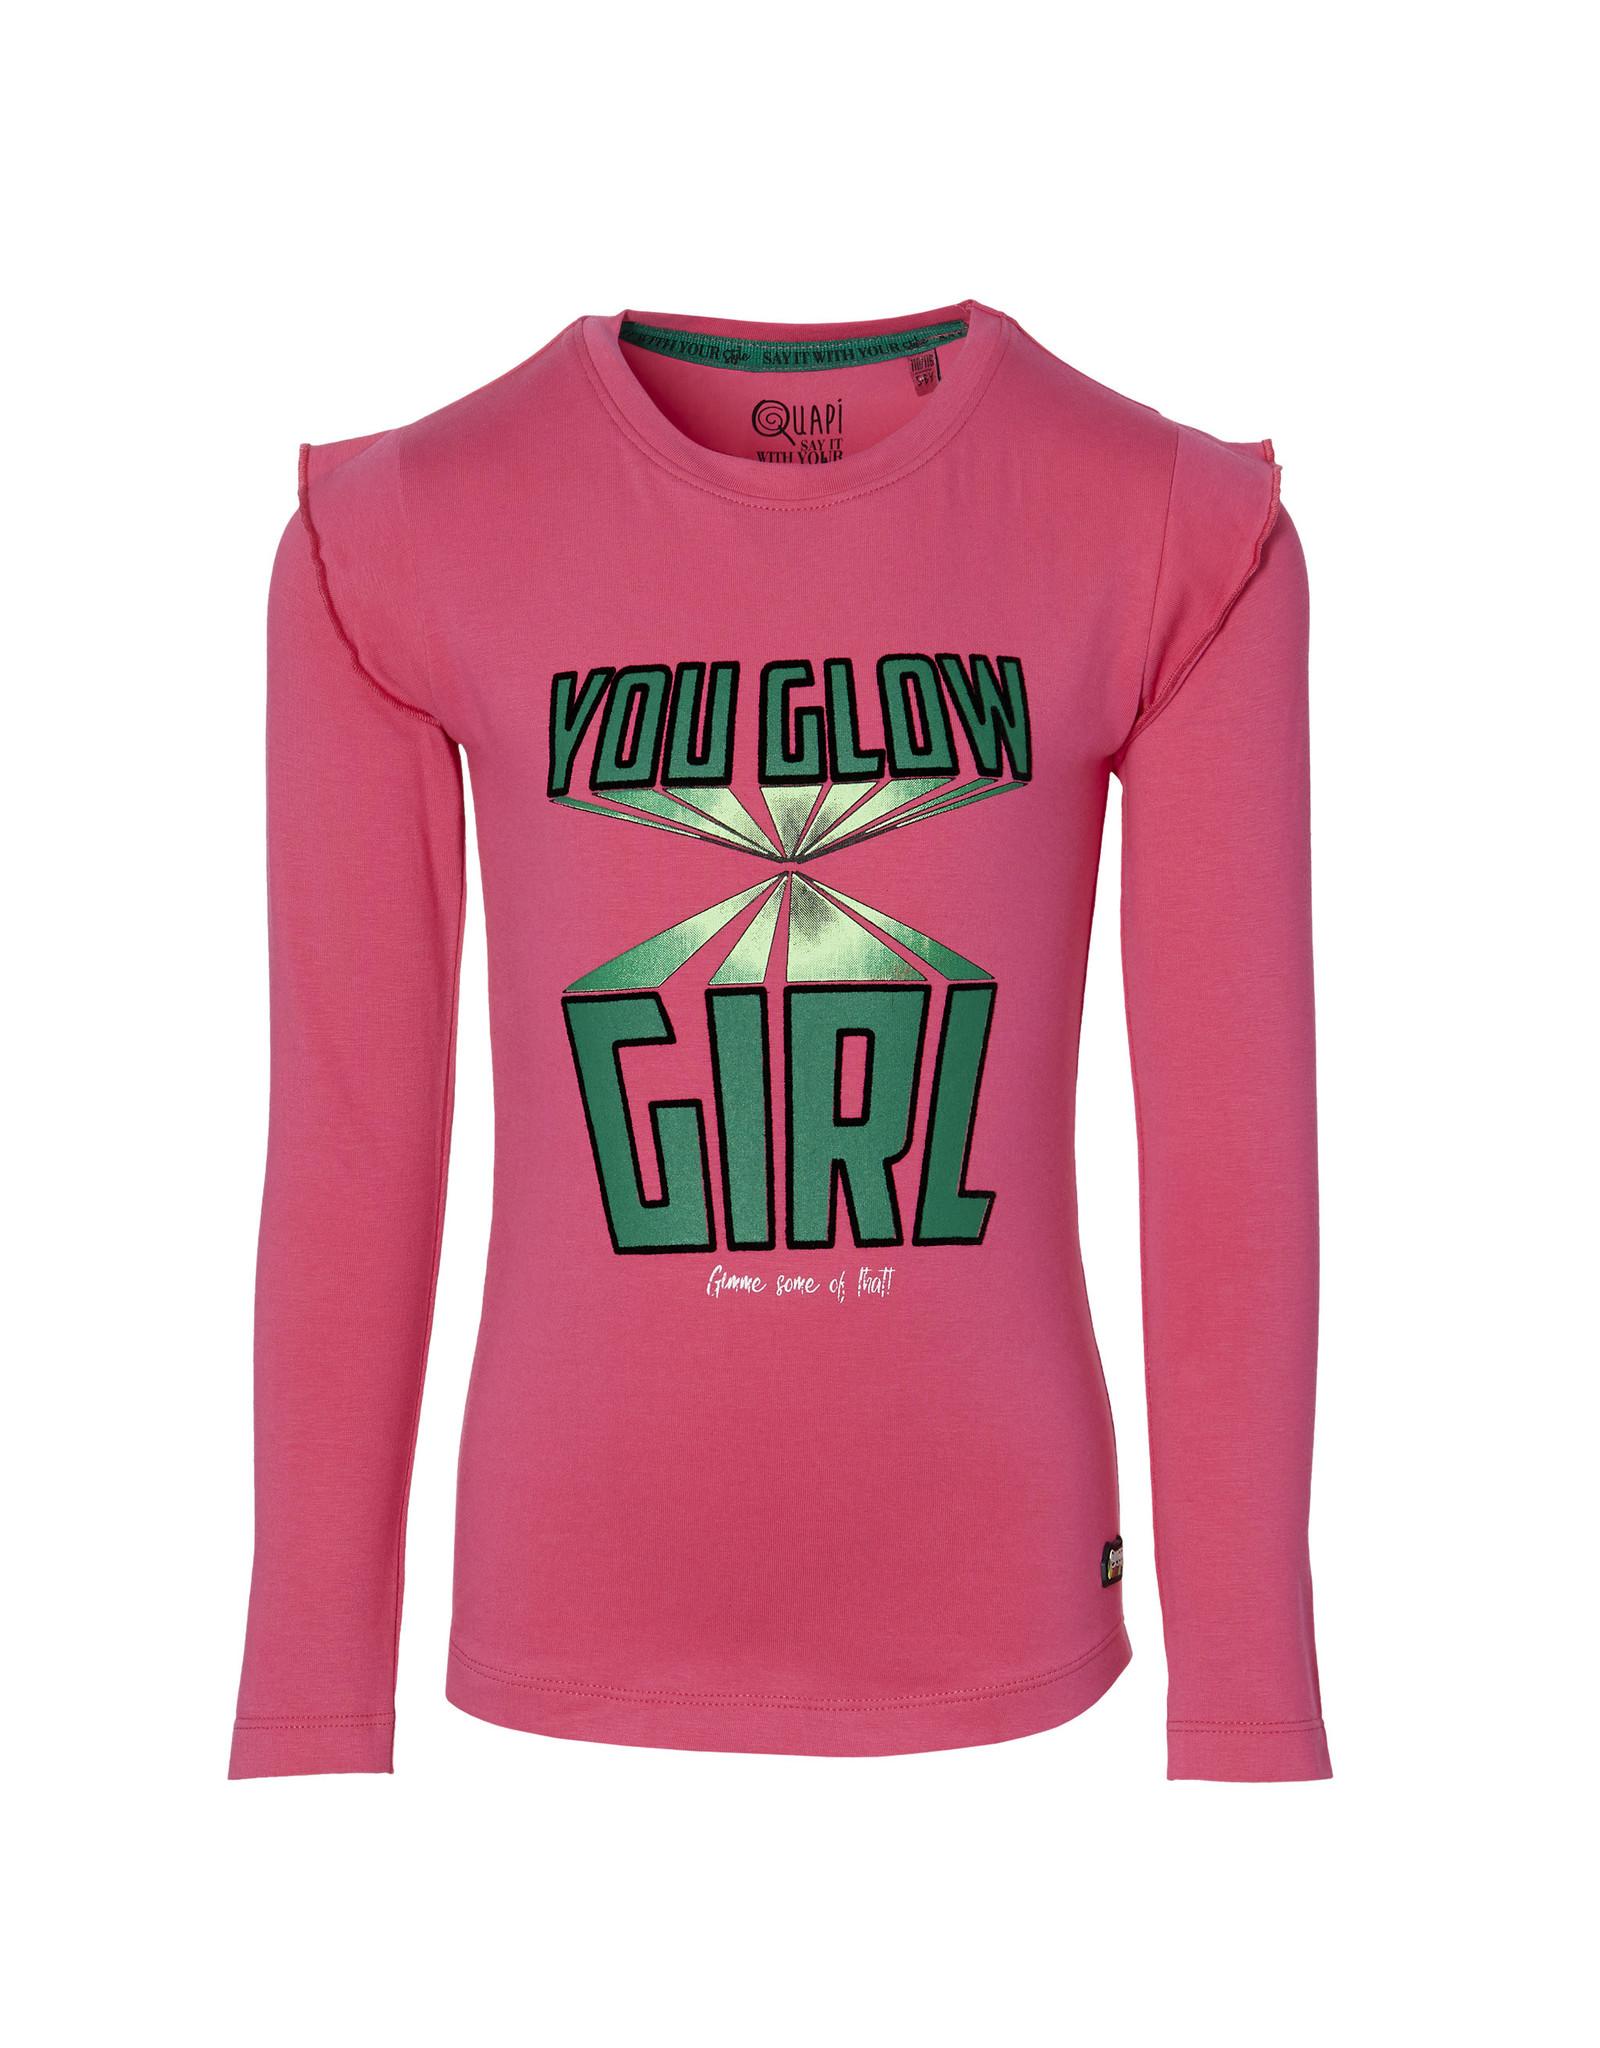 Quapi Quapi meisjes shirt Dani Pink